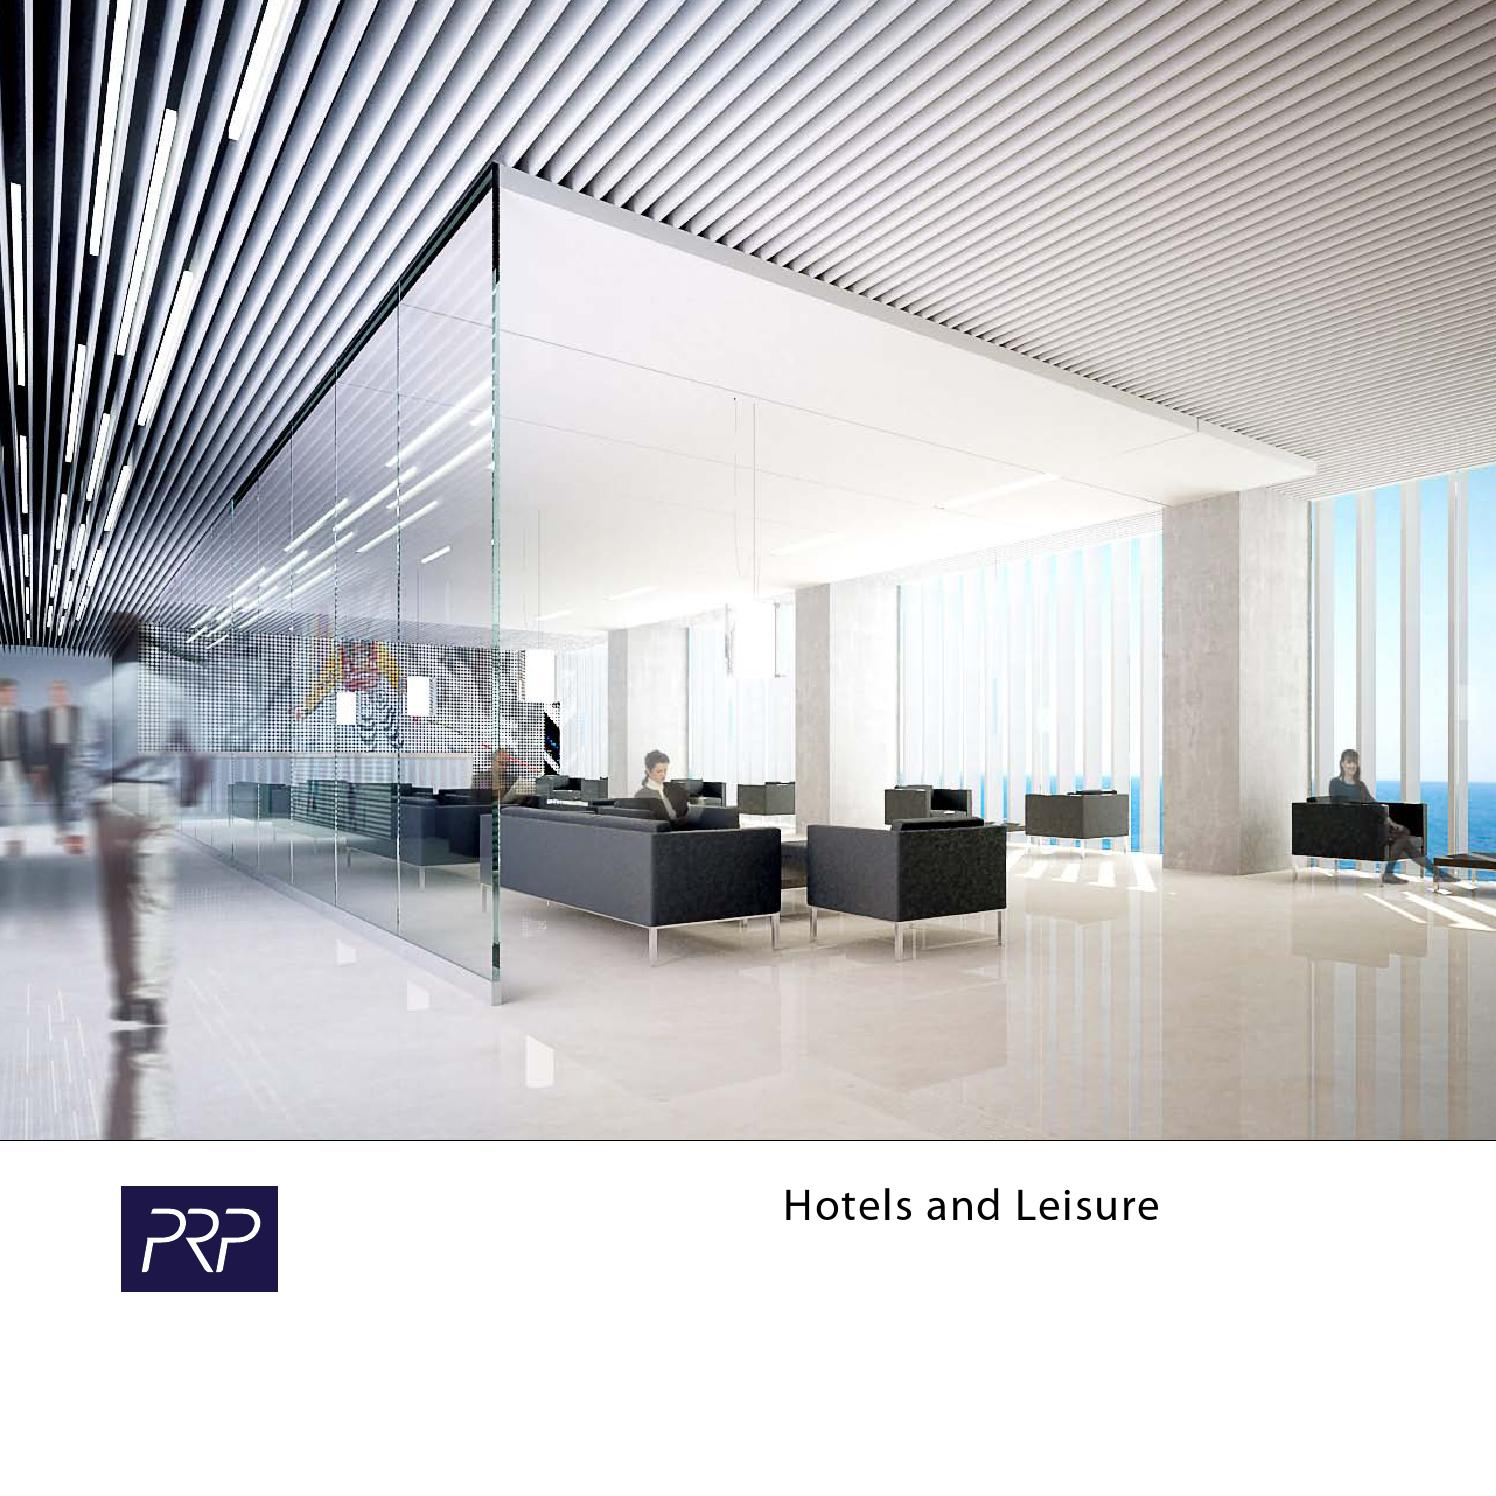 Design Furniture Bab Ezzouar prp hotels & leisure brochureprp architects - issuu